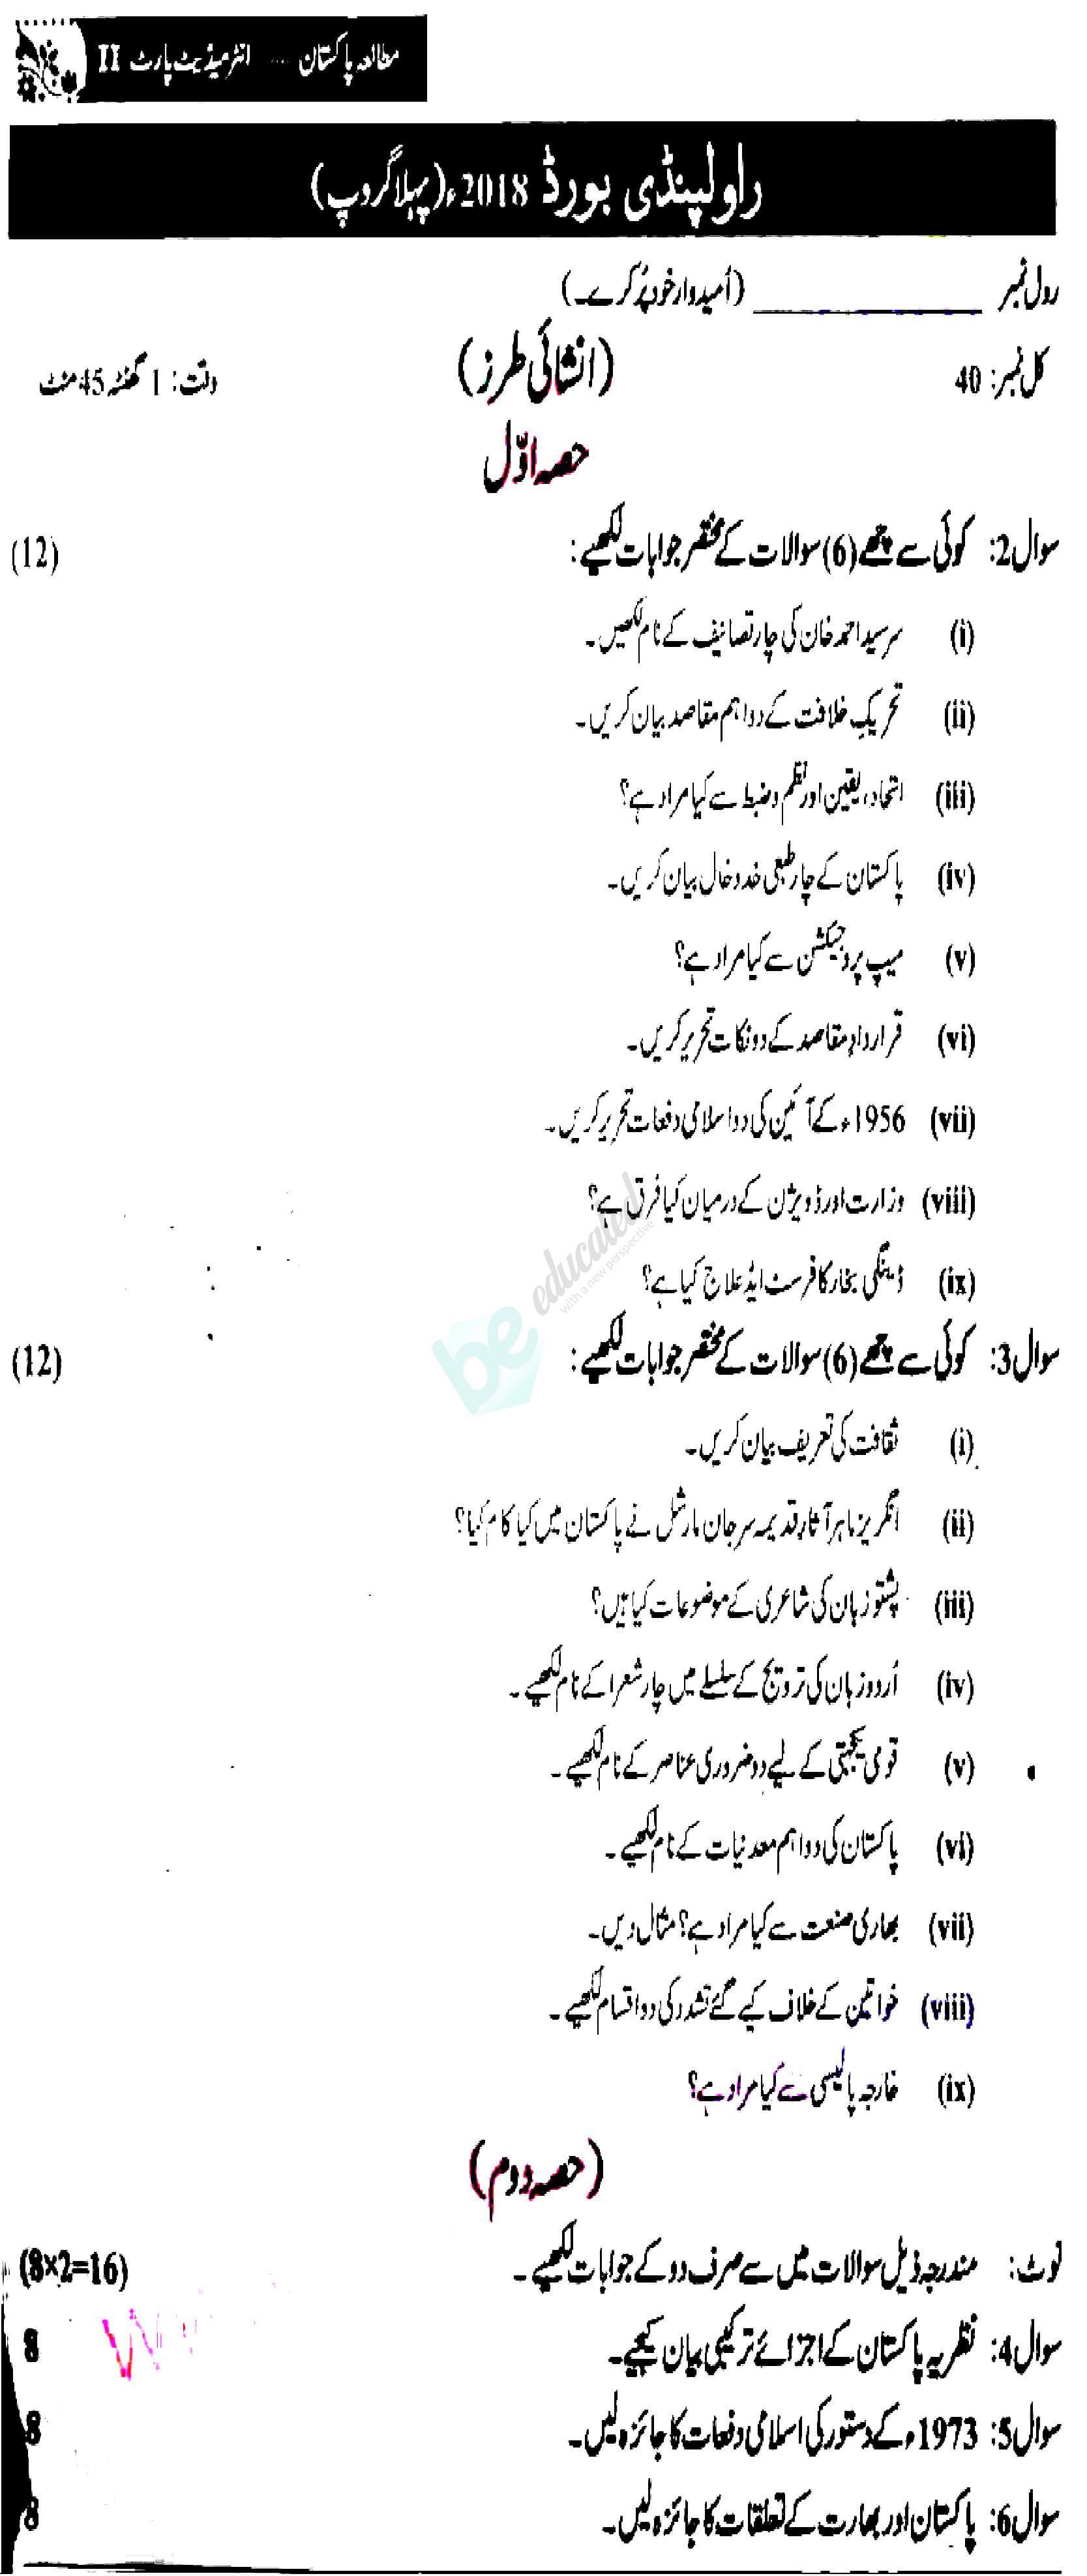 Pak Studies Subject BISE Bahawalpur 12th Class FA Part 2